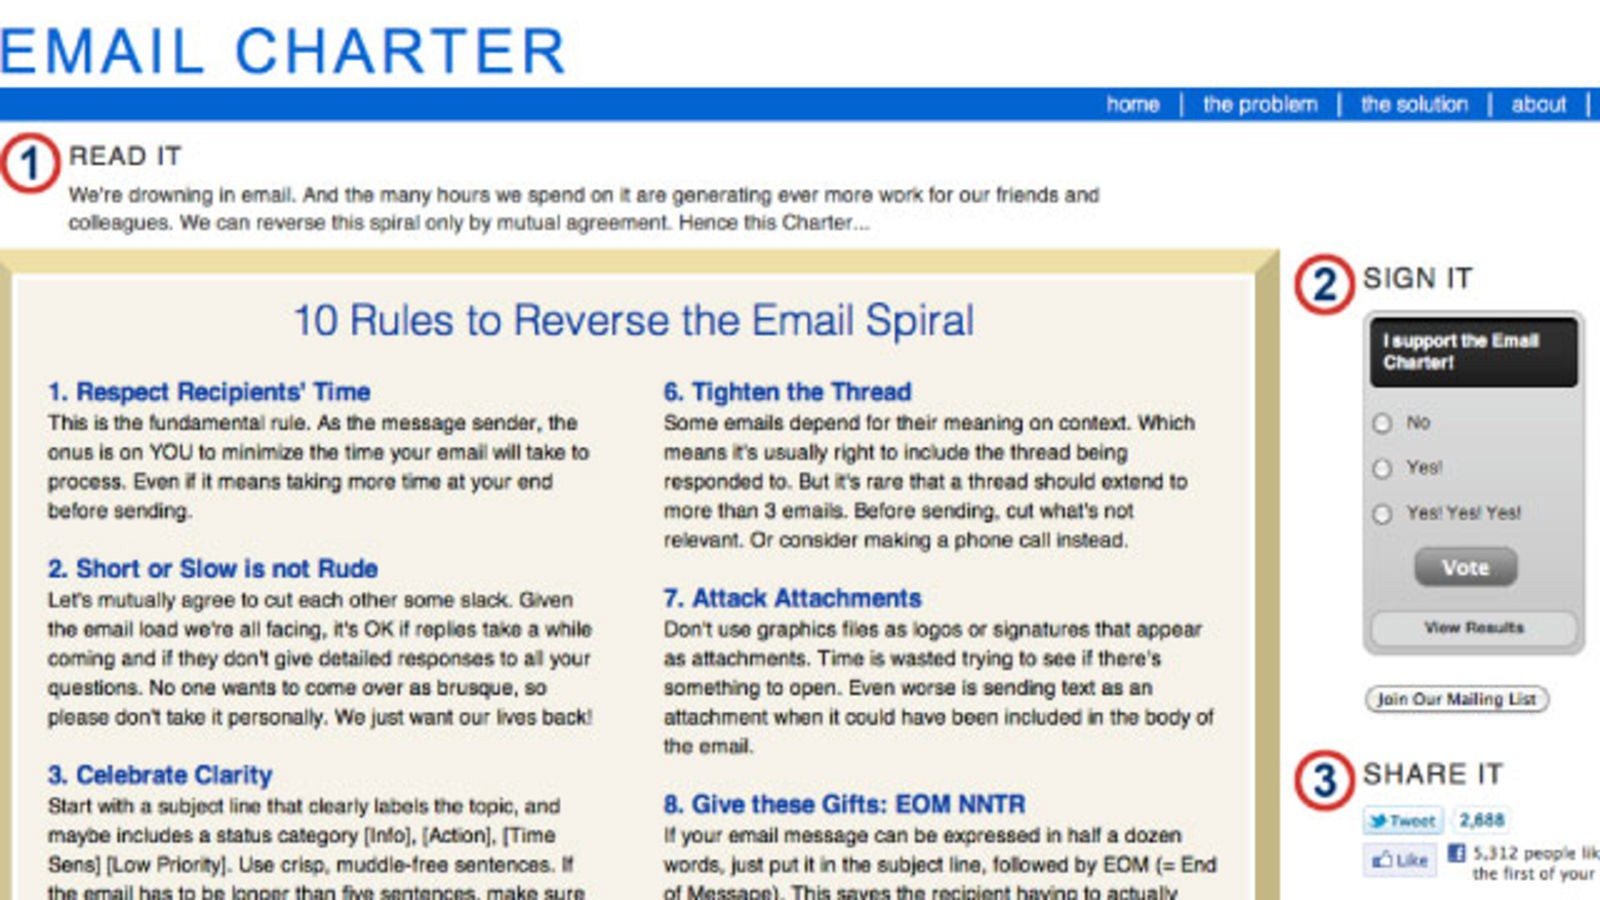 Email Charter Screenshot